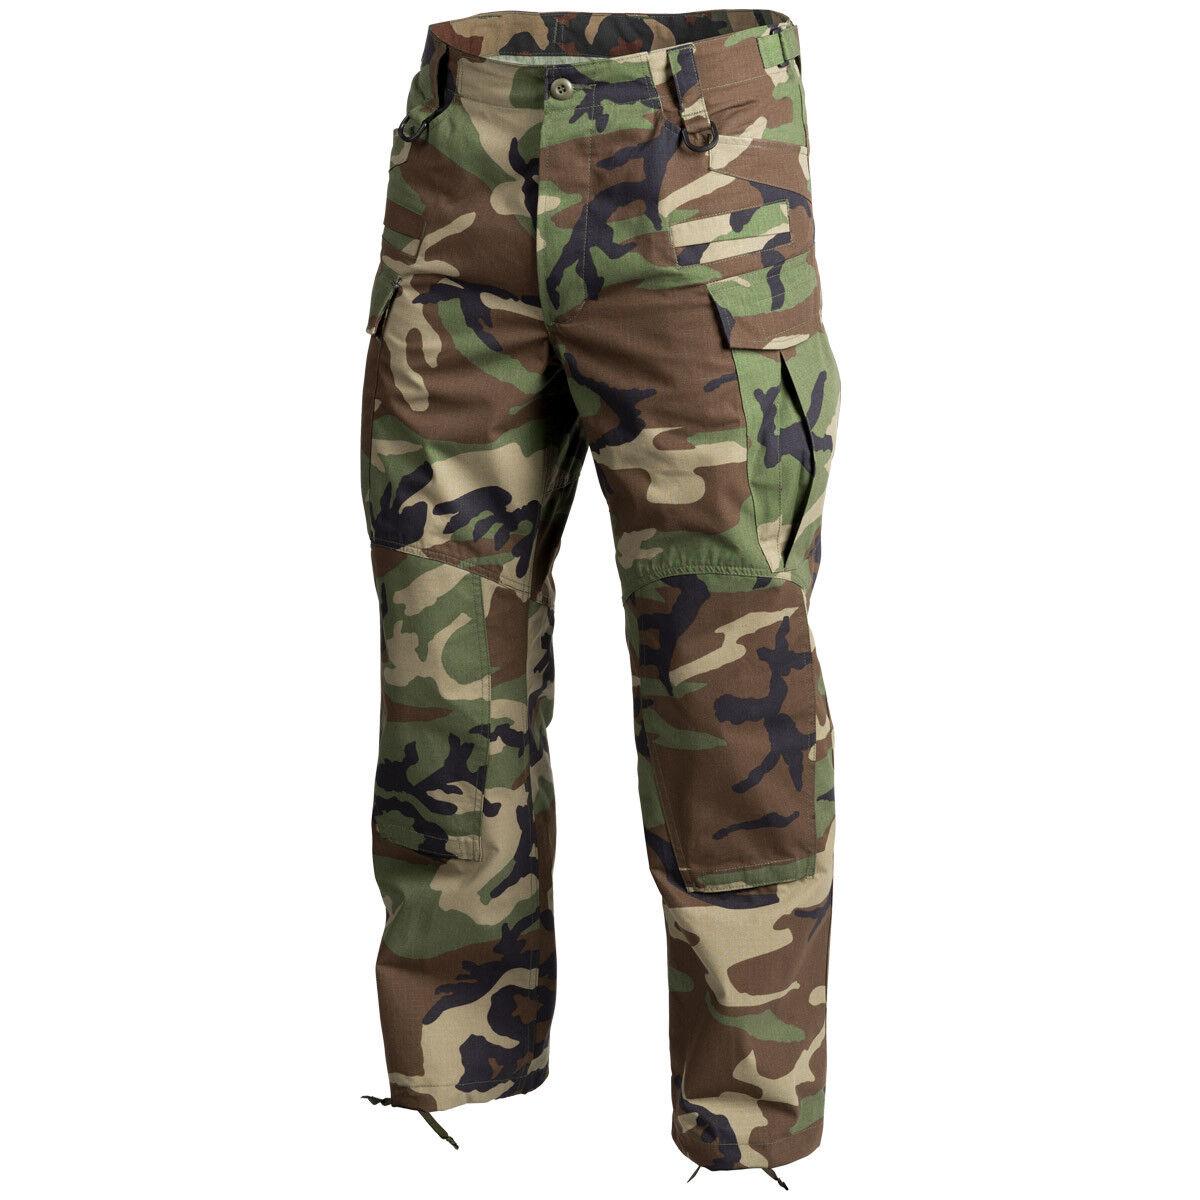 Helikon Sfu Sfu Sfu Avanti Dell'Esercito Pantaloni Militari uomo Cadet Tattico Pantal 83ee02